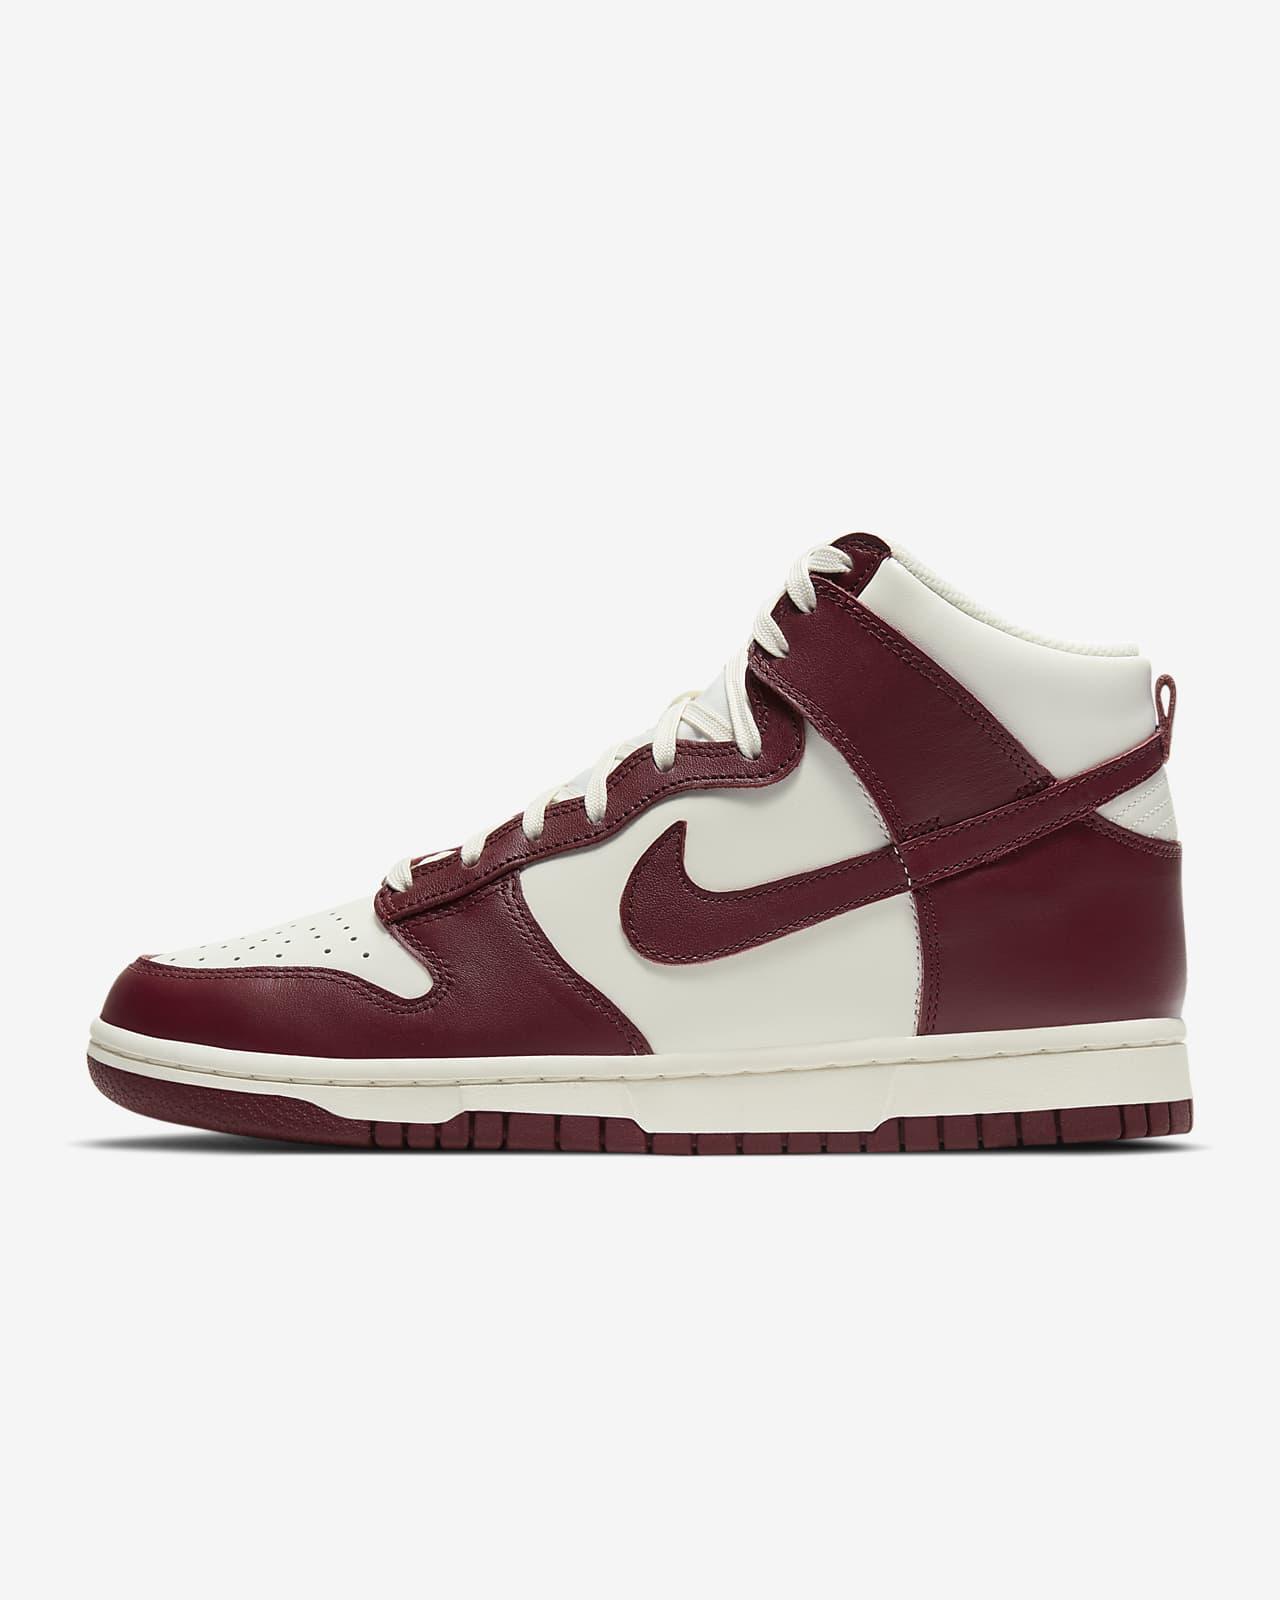 Chaussure Nike Dunk High pour Femme